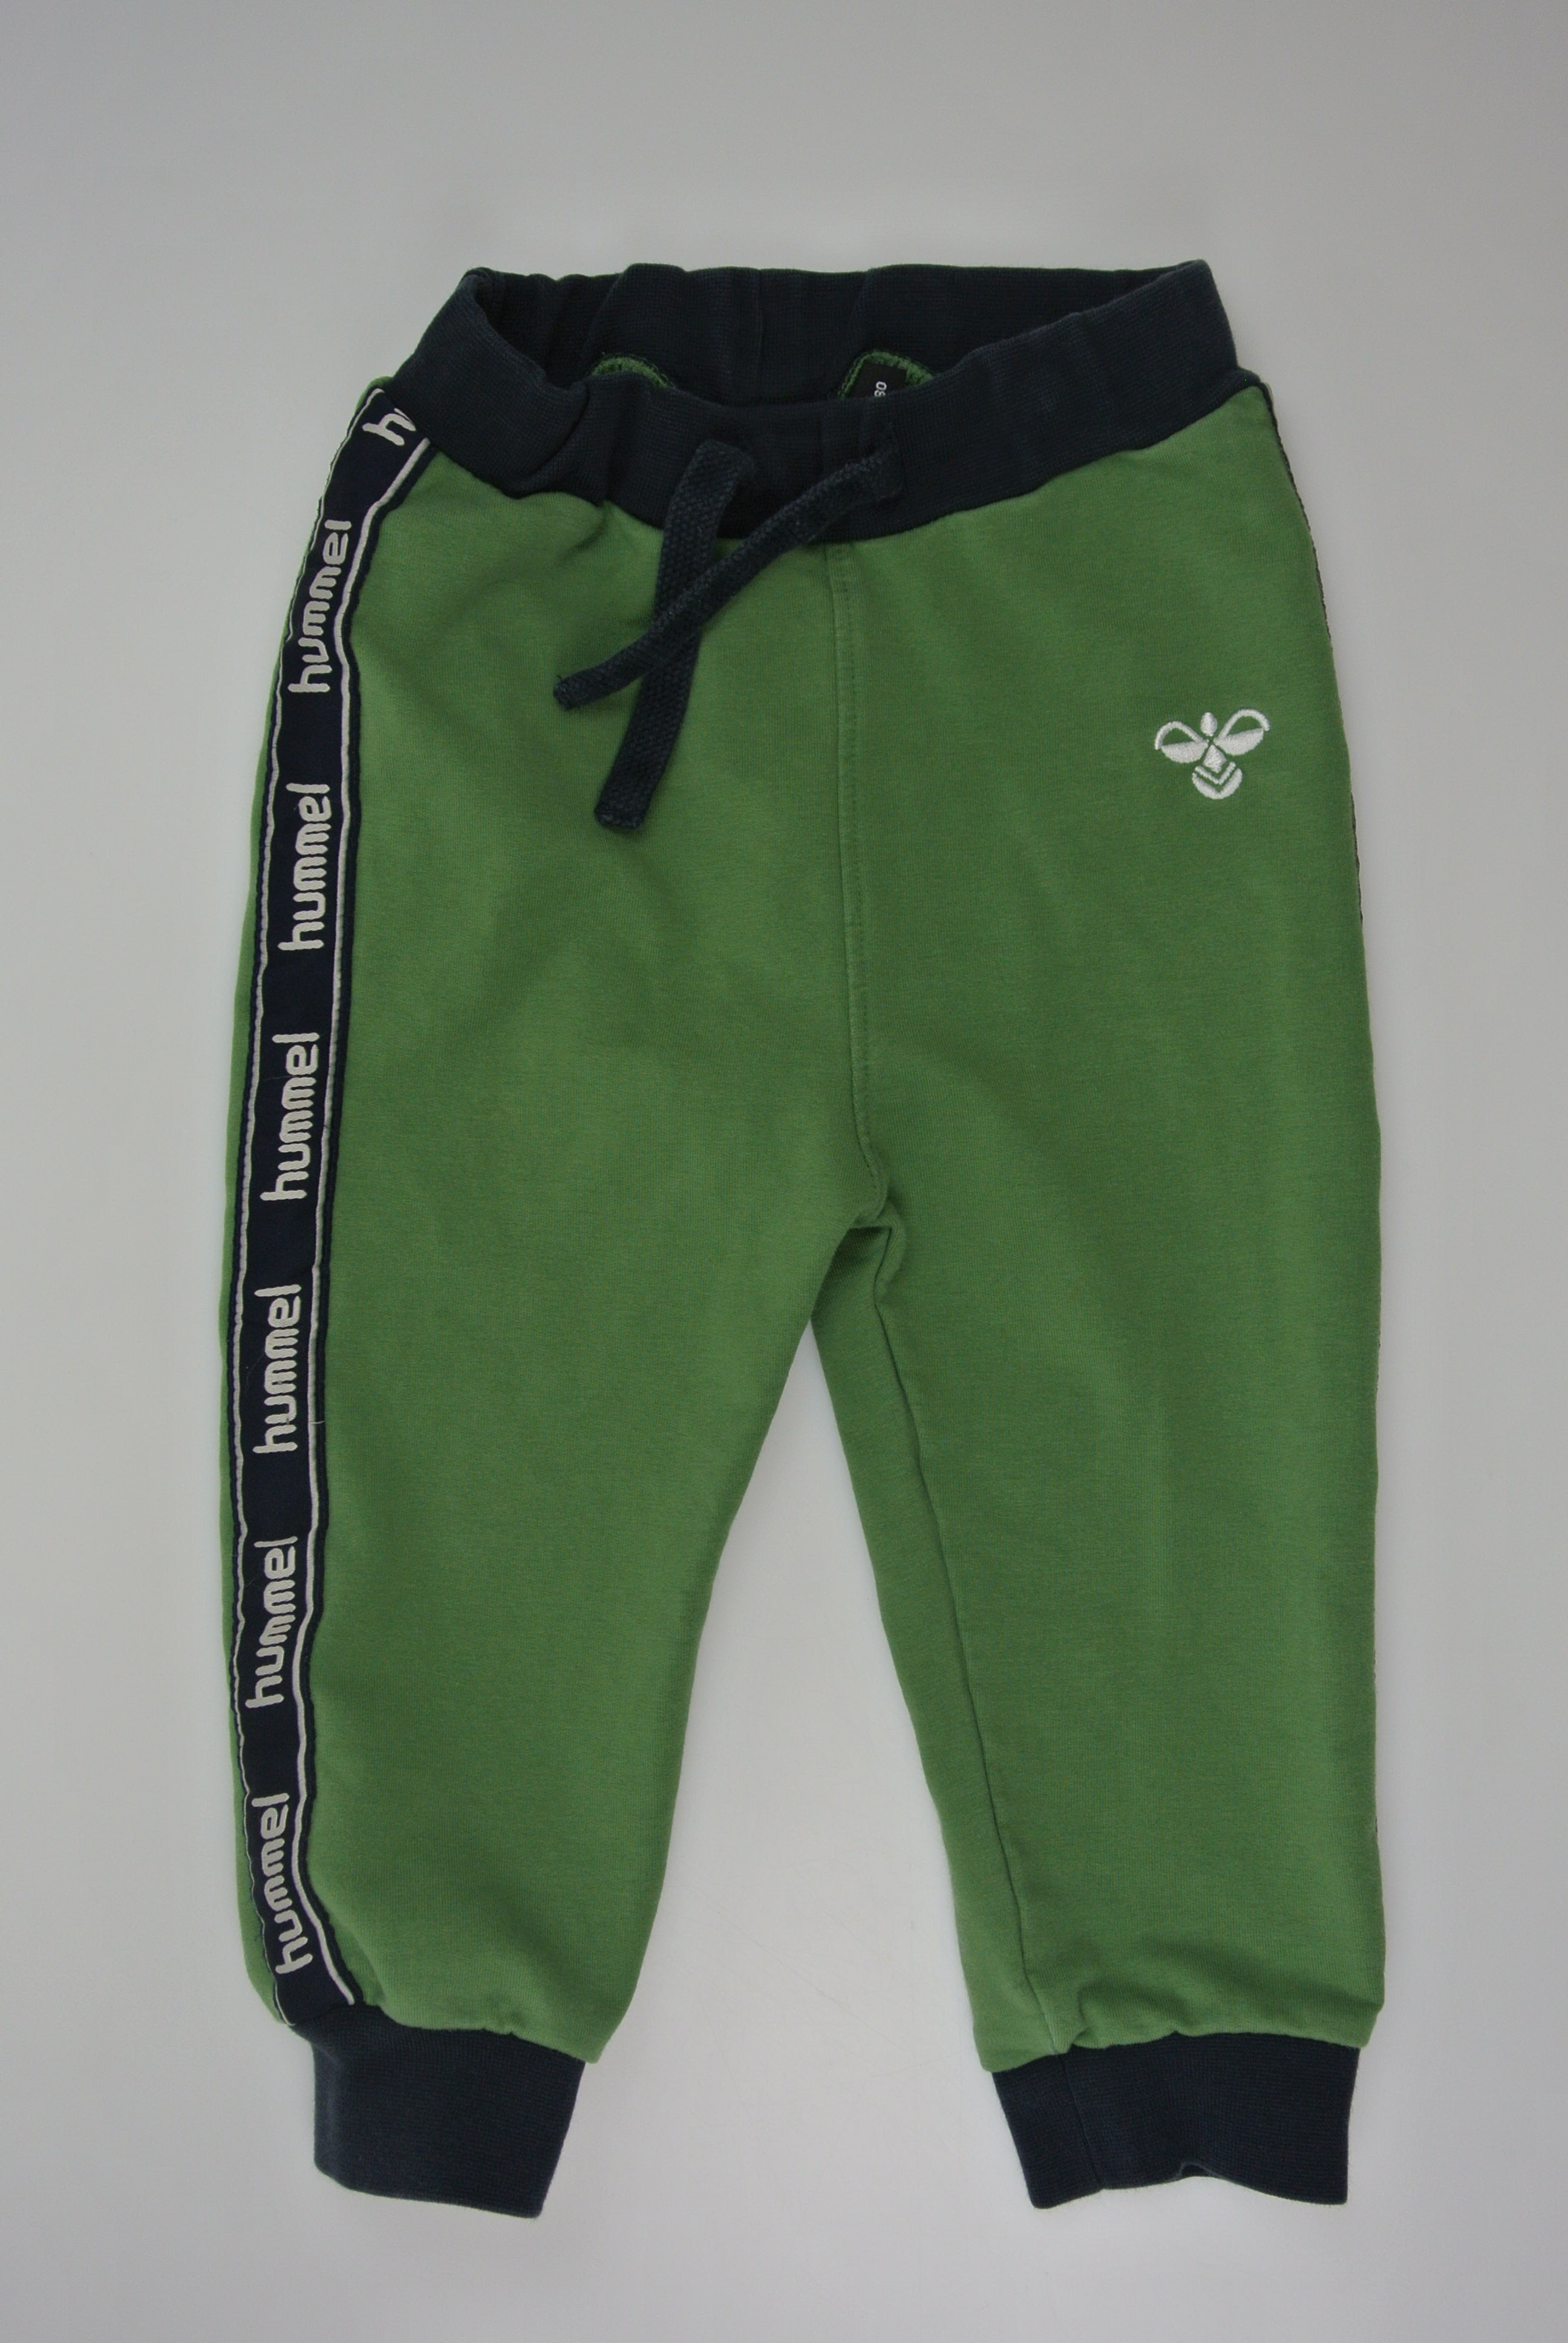 Hummel bukser str 80 dreng